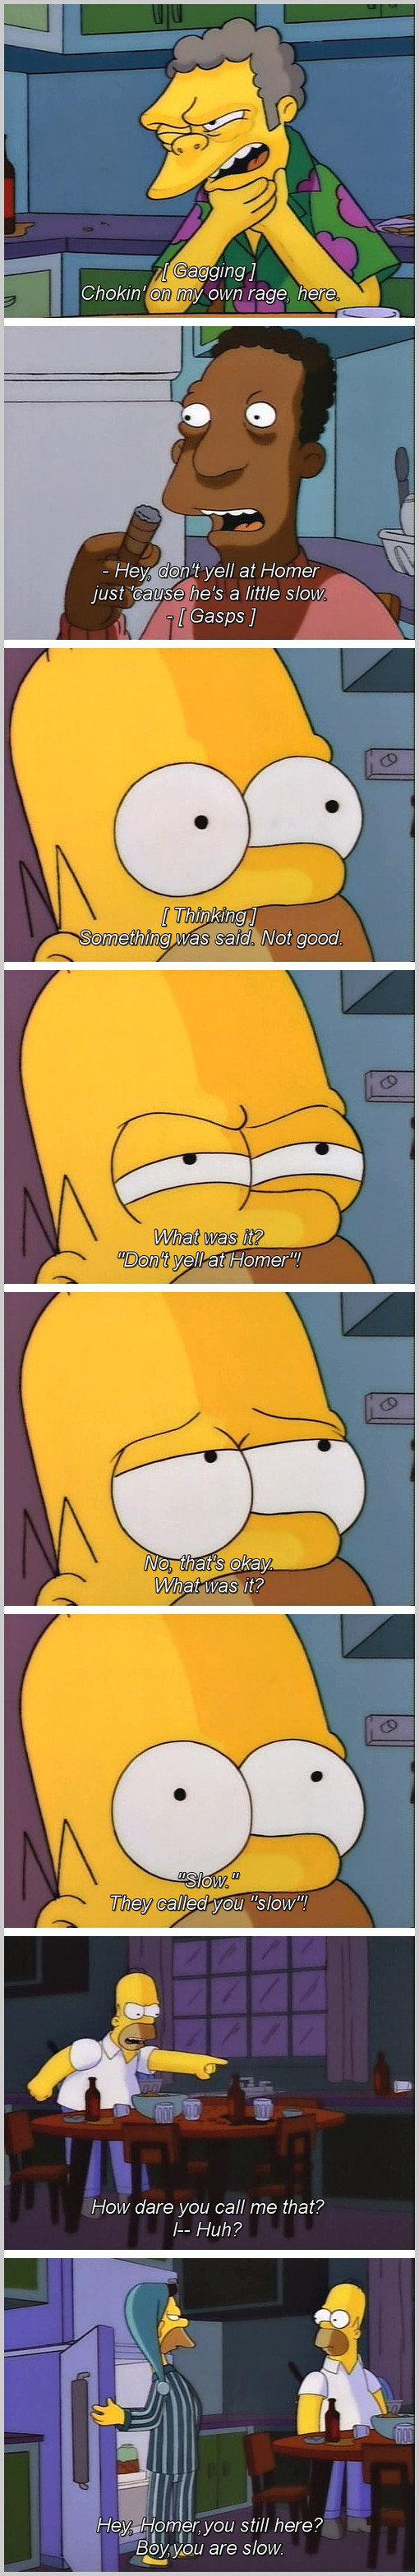 "Homer. . tii"" it"" Birgit' ll' 1' tr, itifoi) good. How dare you cali me that? In Huh? f) (viii. iill,/ torr' tr, you sitll here? f/ are slow. Homer tii"" it"" Birgit' ll' 1' tr itifoi) good How dare you cali me that? In Huh? f) (viii iill / torr' sitll here? f/ are slow"